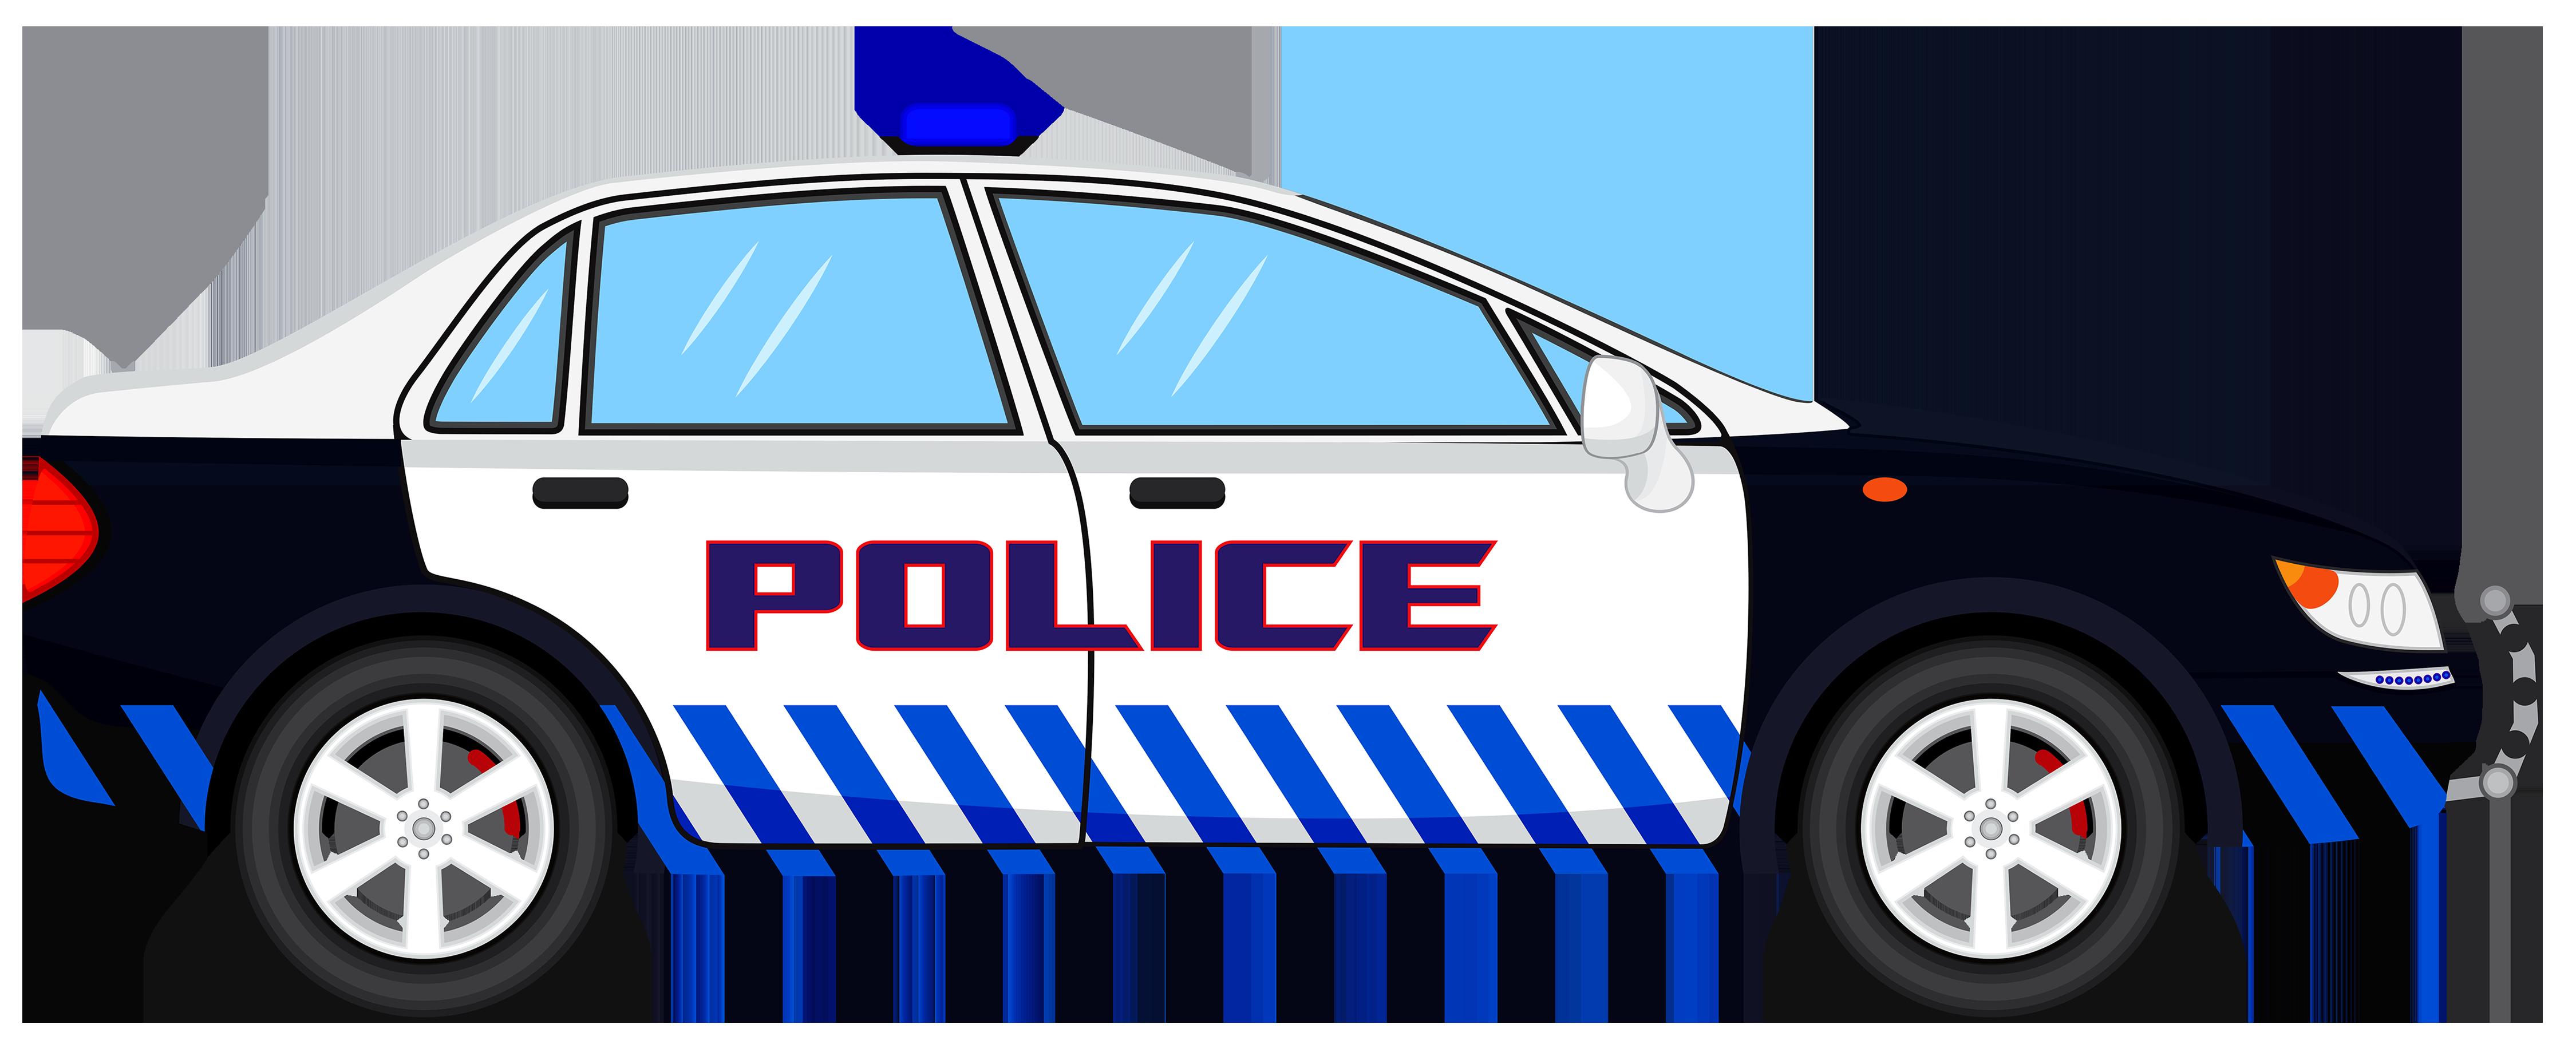 4500x1817 Police Car Transparent Clip Art Image